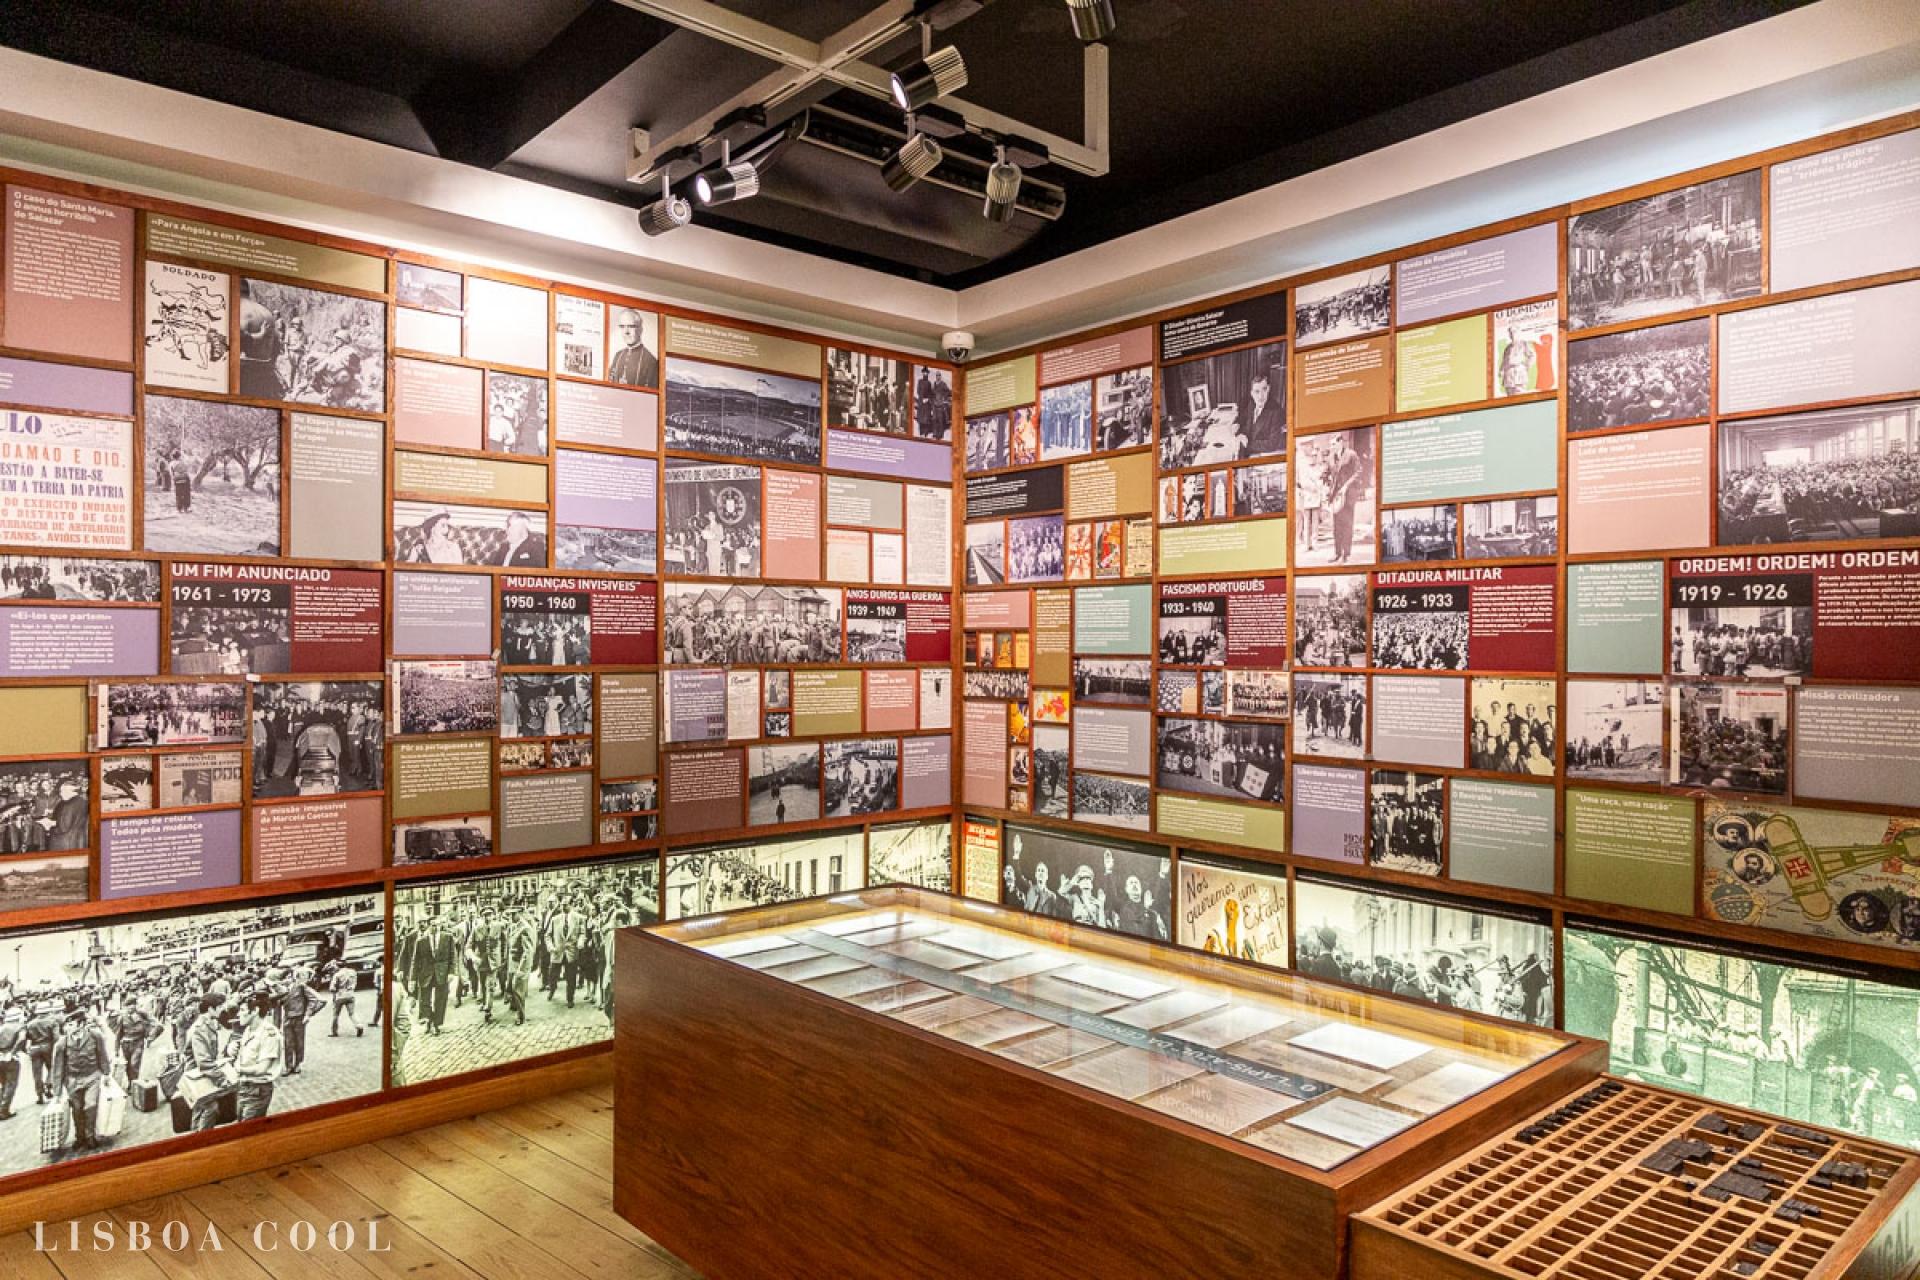 LisboaCool_Visitar_Museu_do_Aljube-Resistência_e_Liberdade